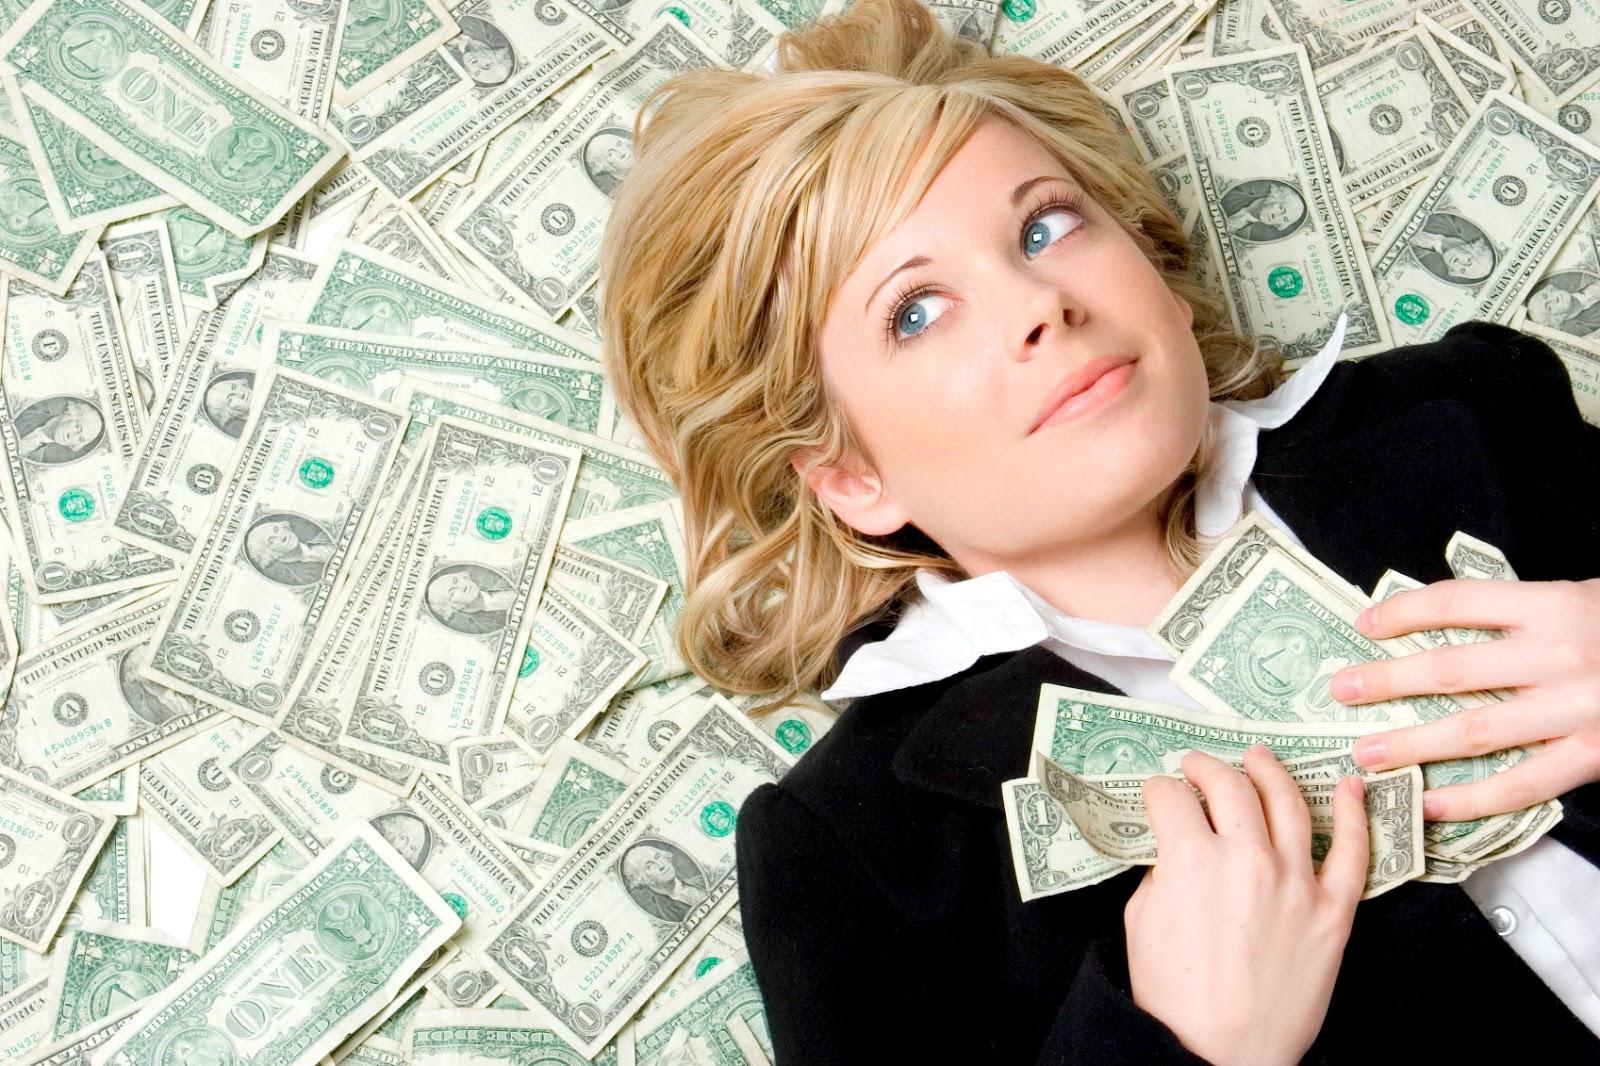 Картинки карьера для карты желаний с деньгами